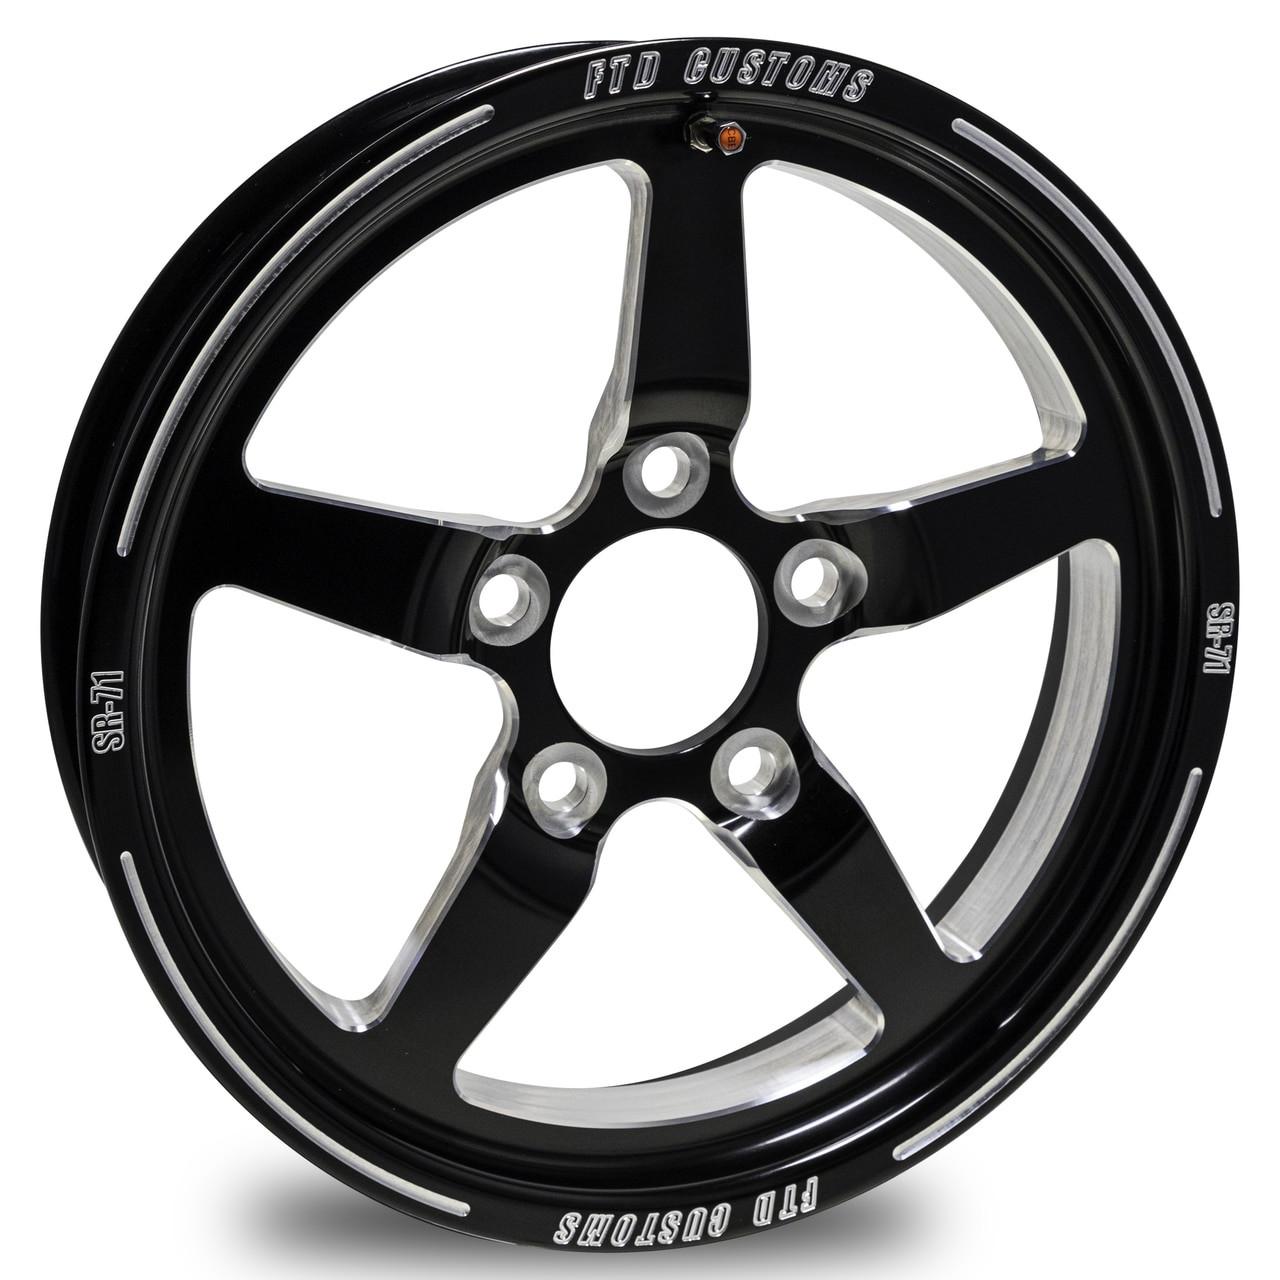 "FTD 15x3.5"" SR-71 Black Contrast Drag Racing Wheels"